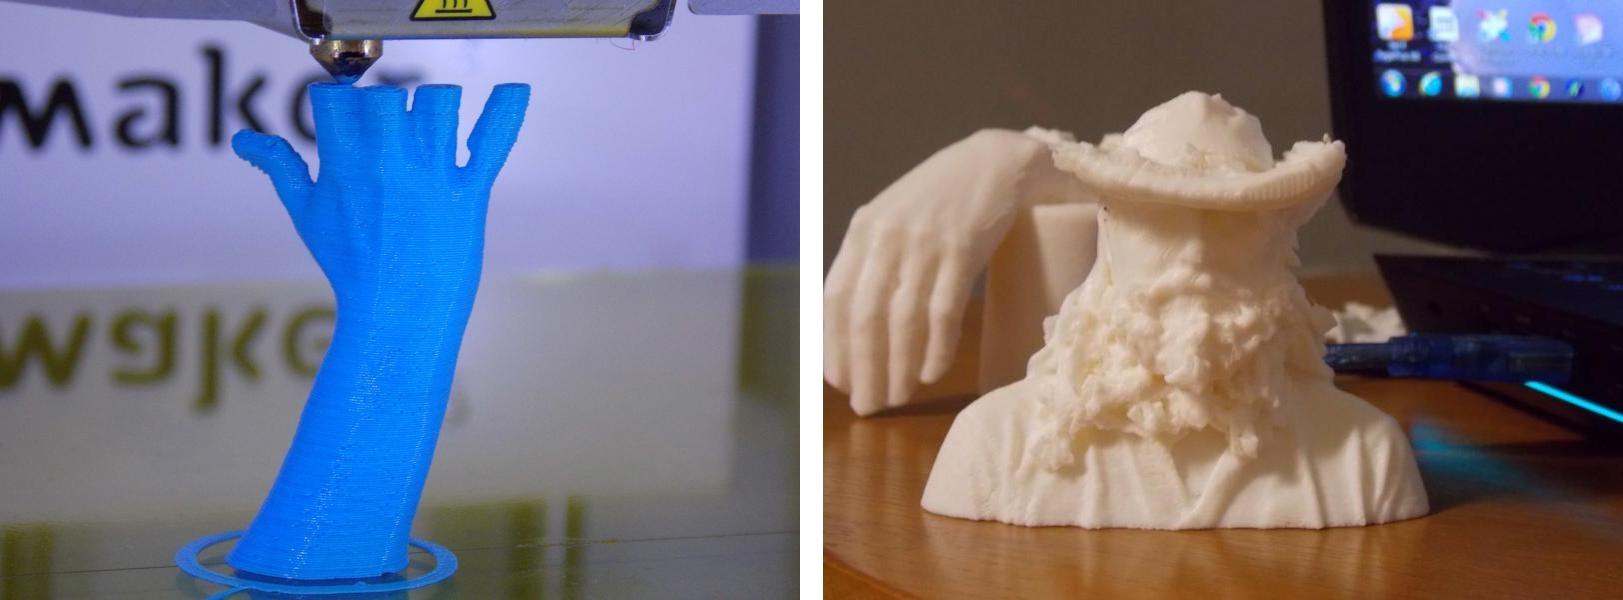 3Dprinting-ensemble